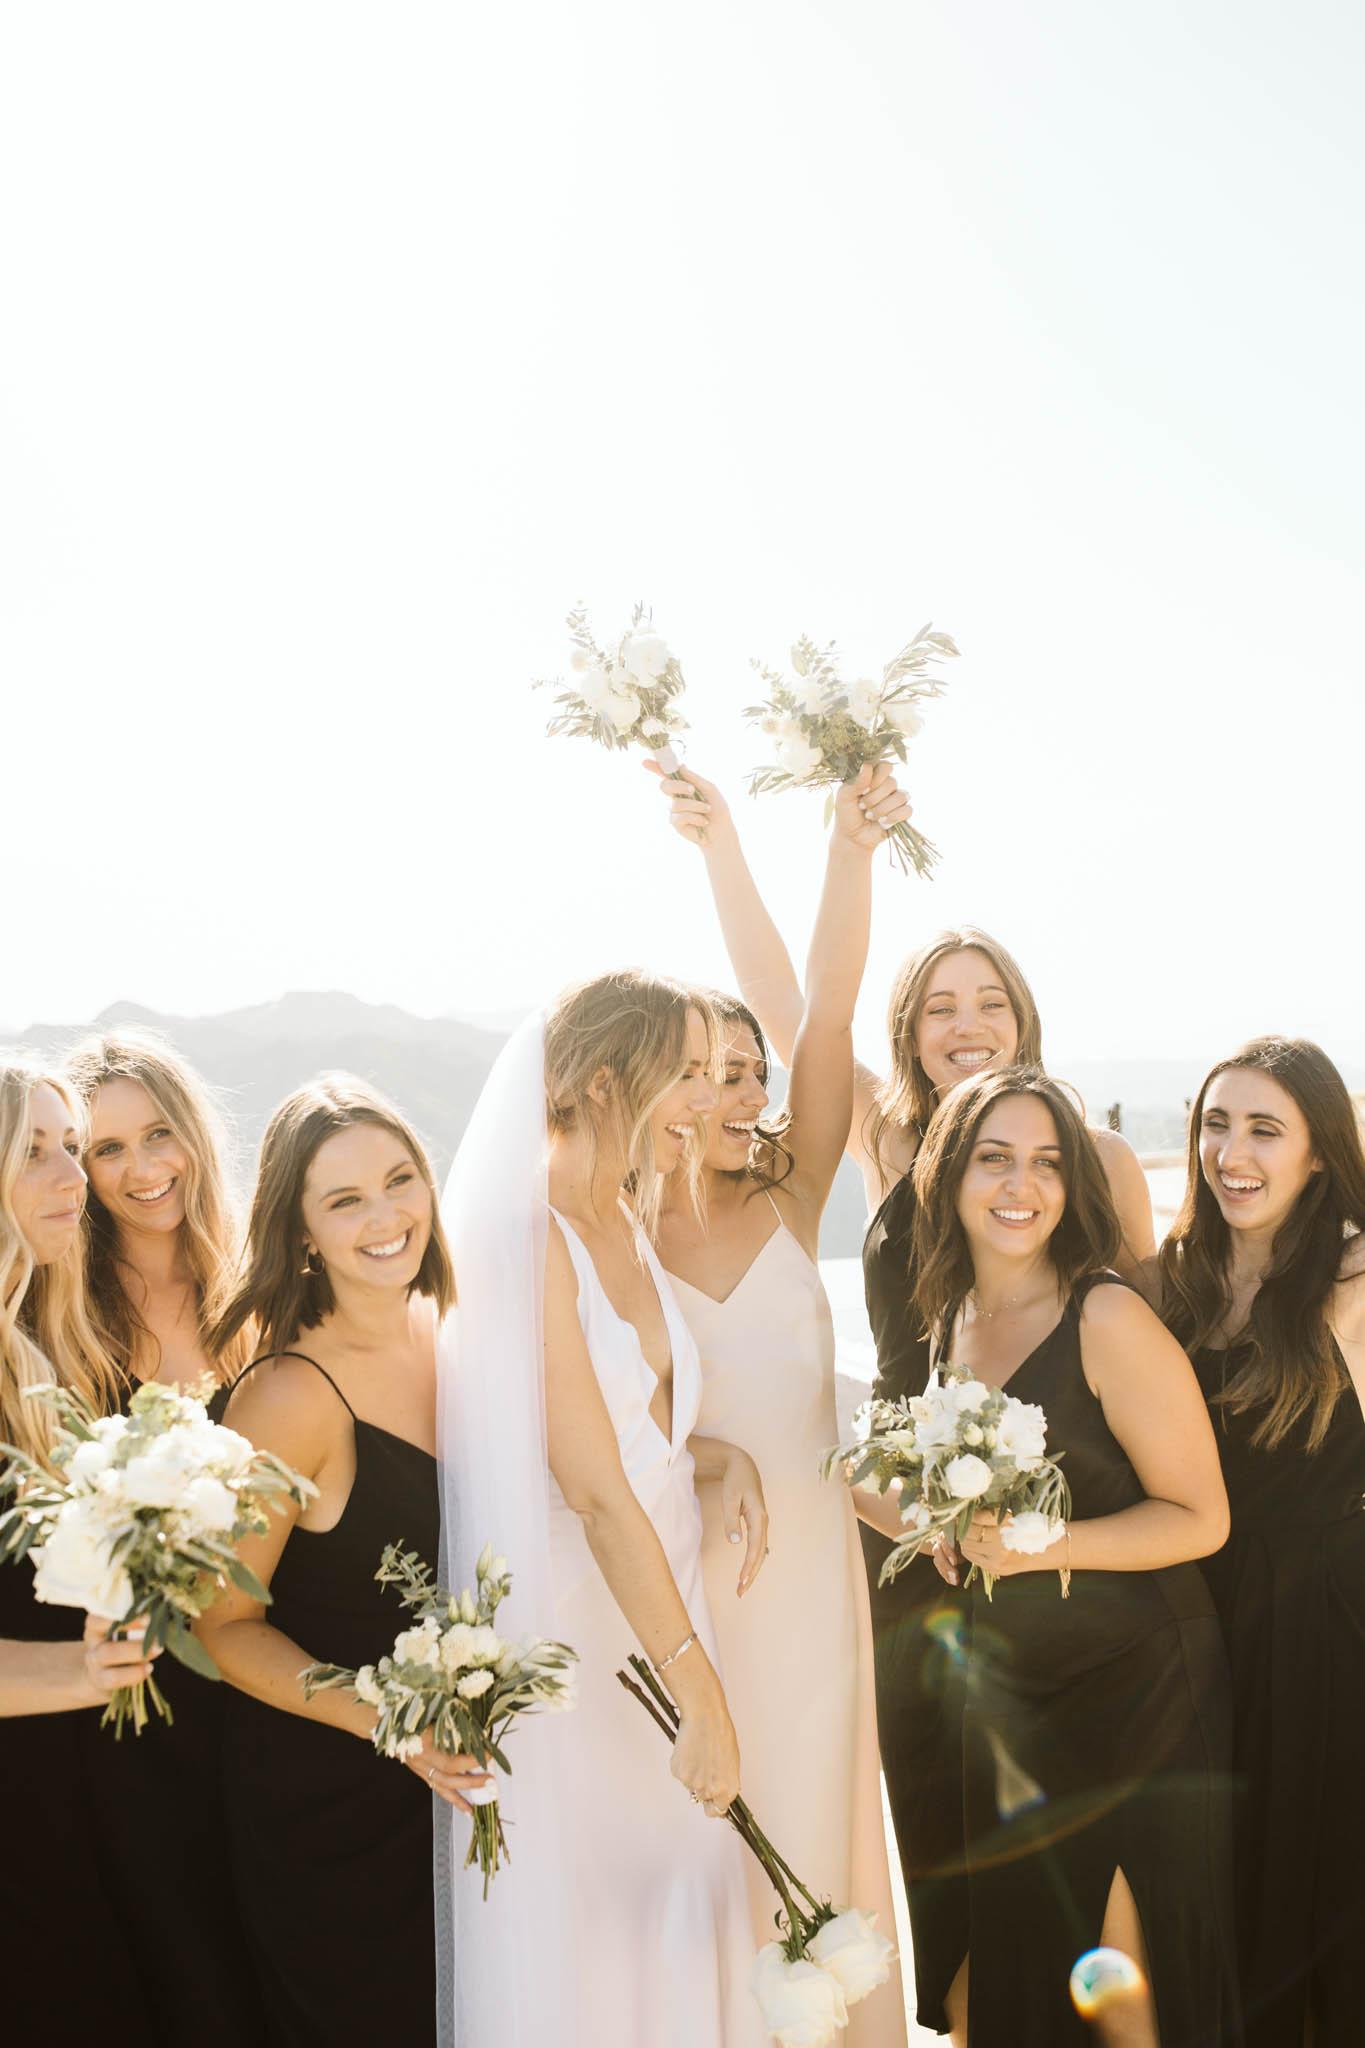 BridesmaidsMack-7.jpg